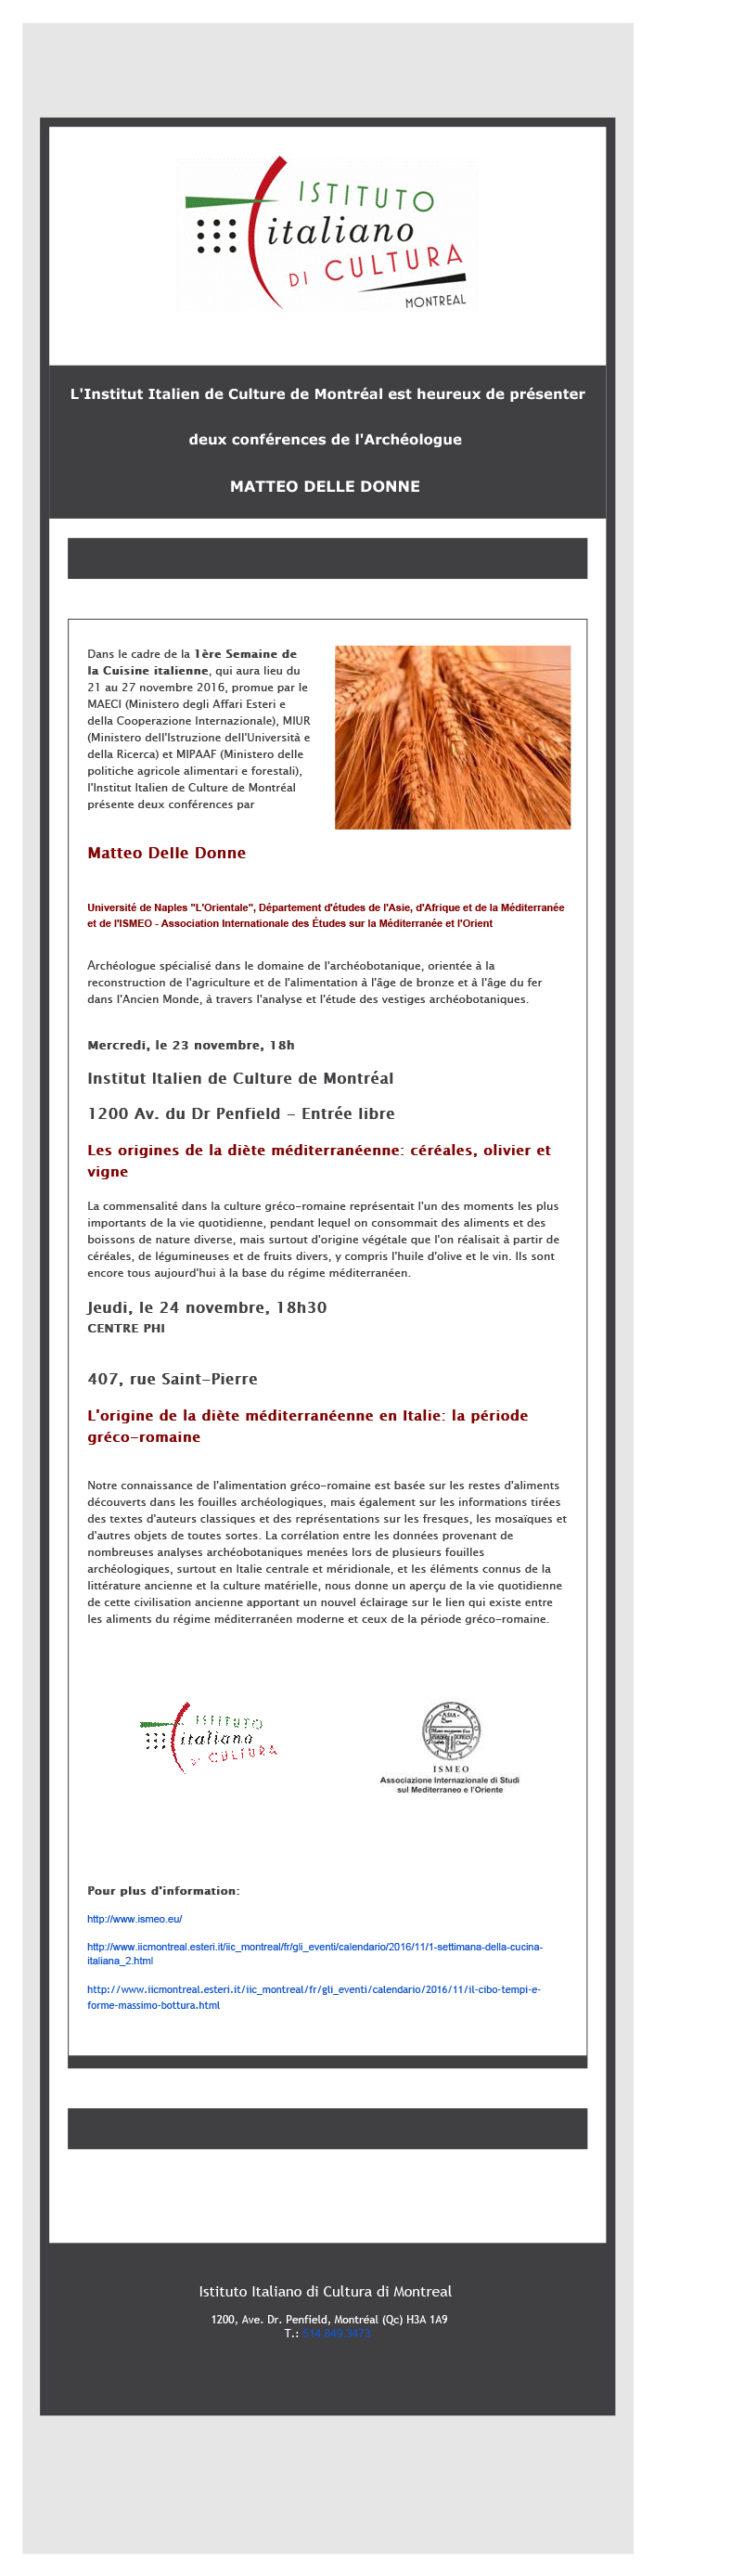 locandina-ist-cult-montreal